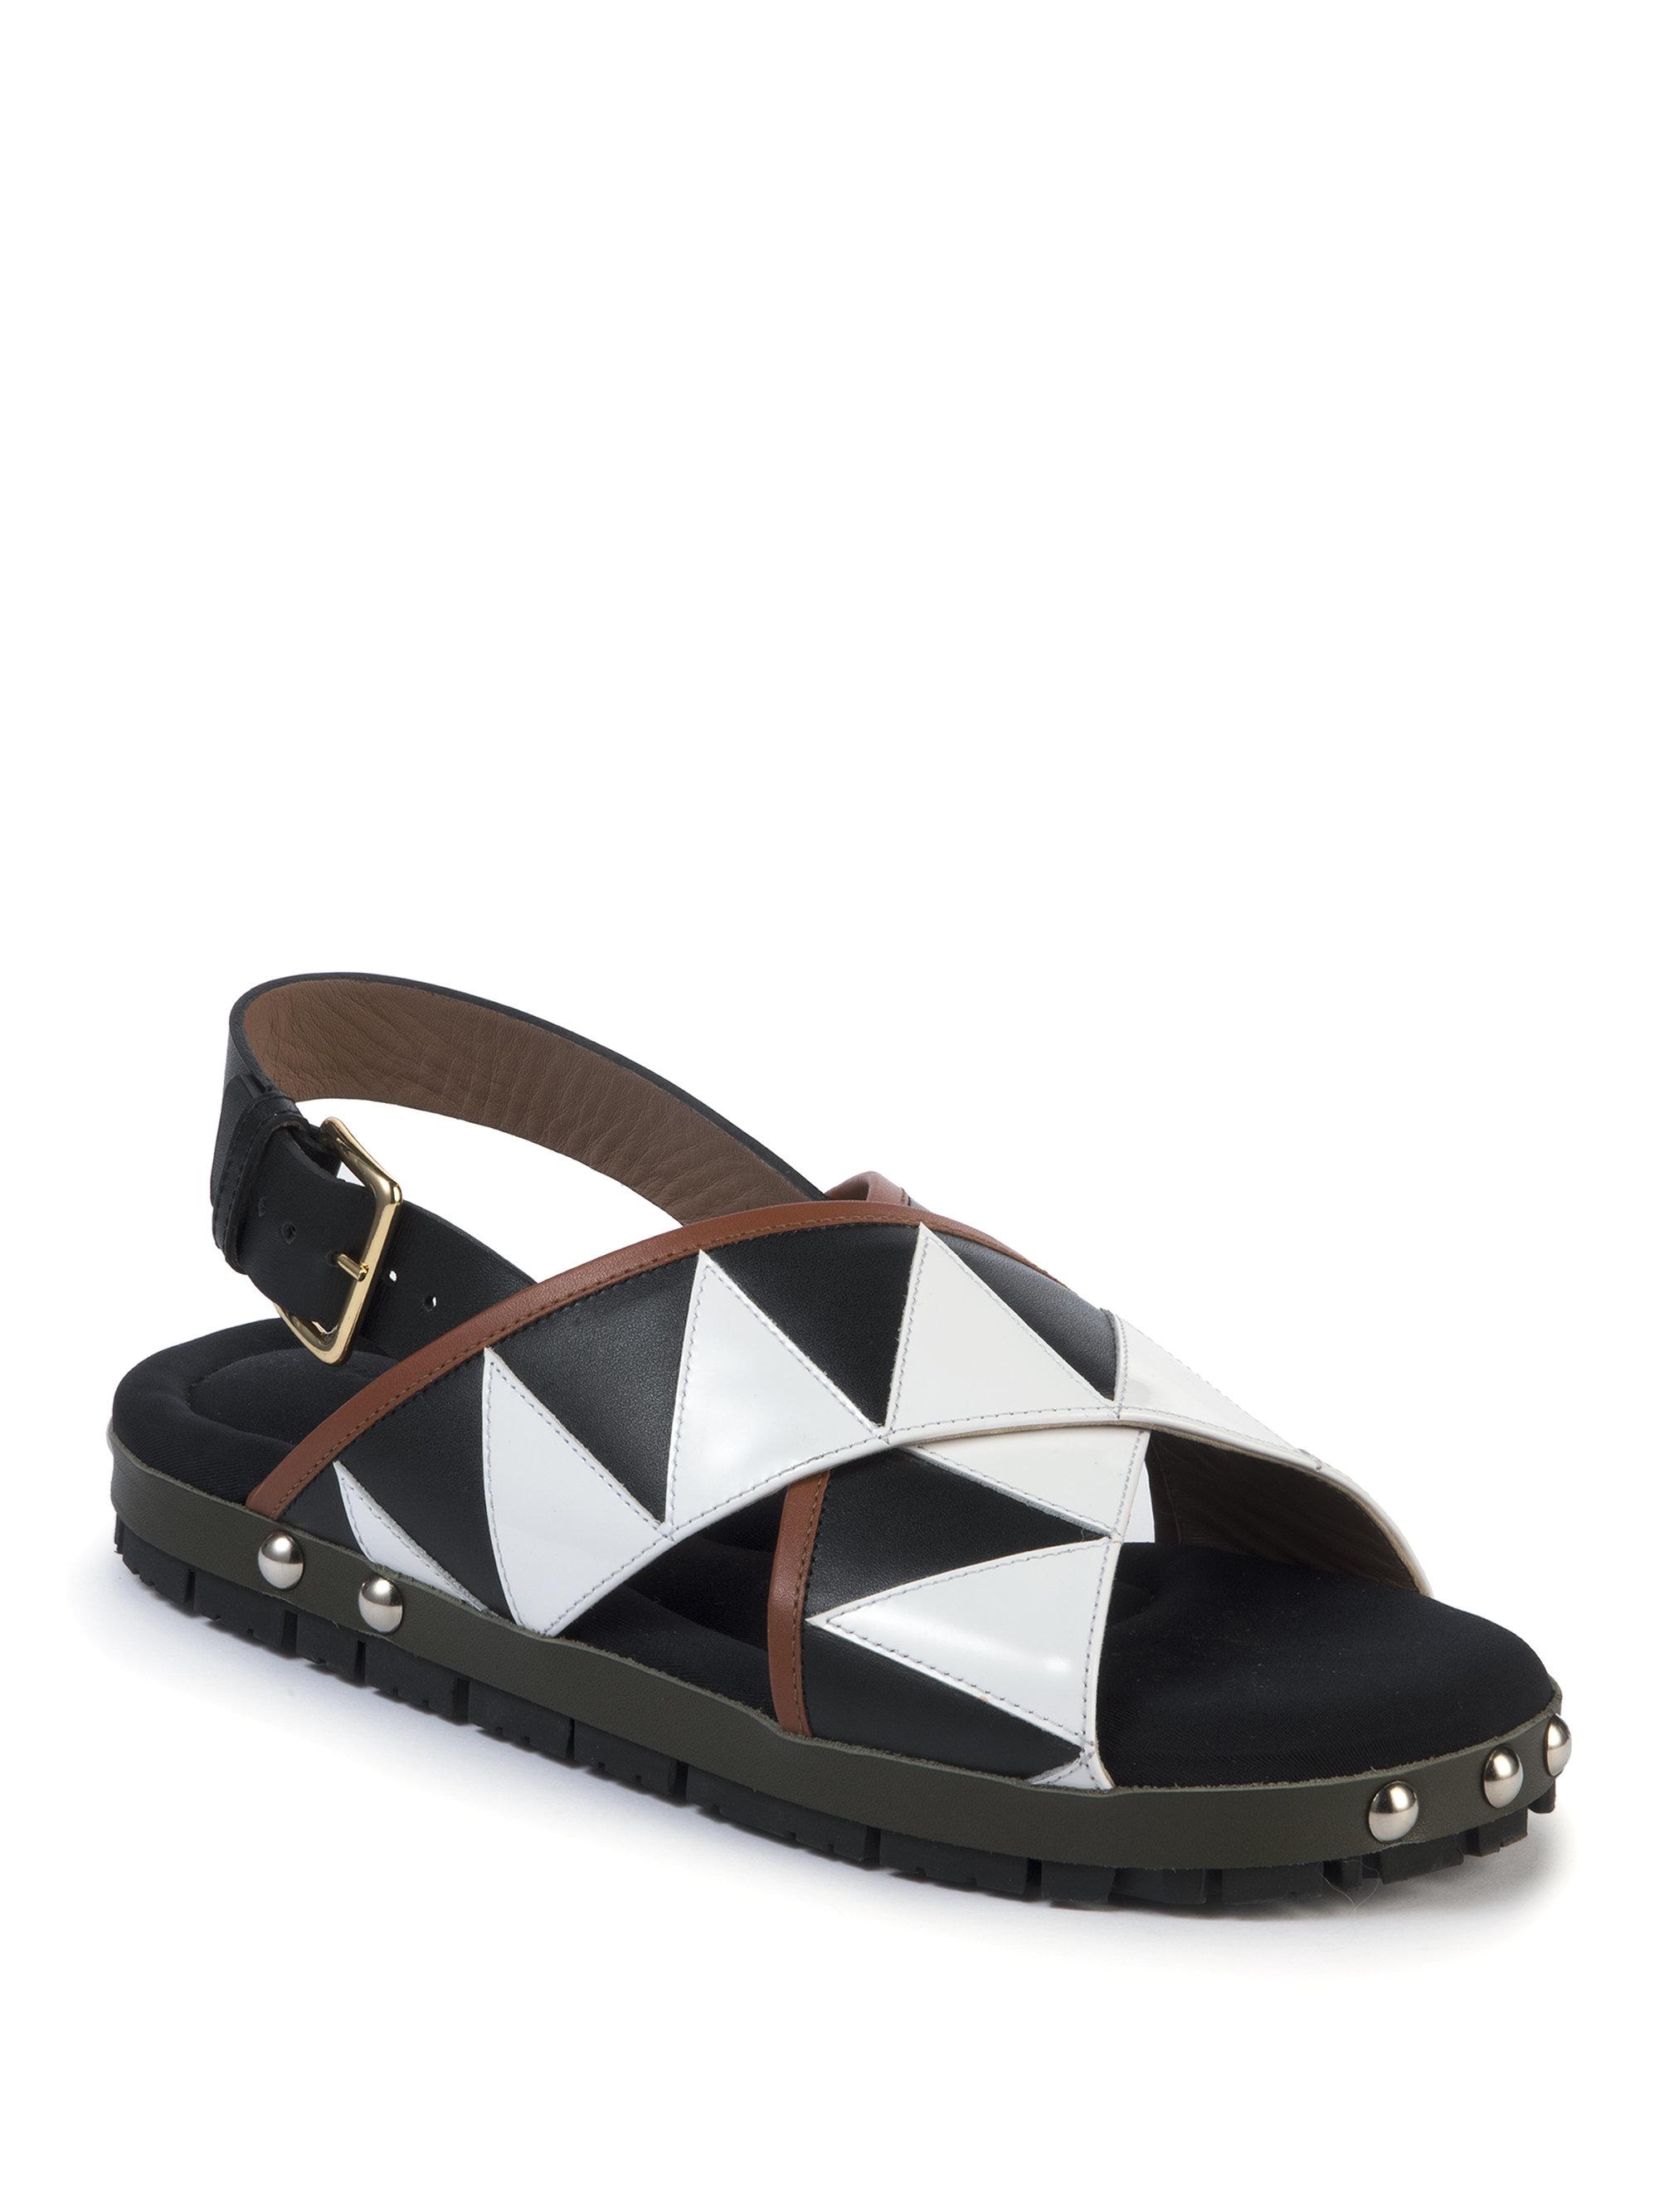 Lyst Marni Geometric Leather Crisscross Flat Sandals In